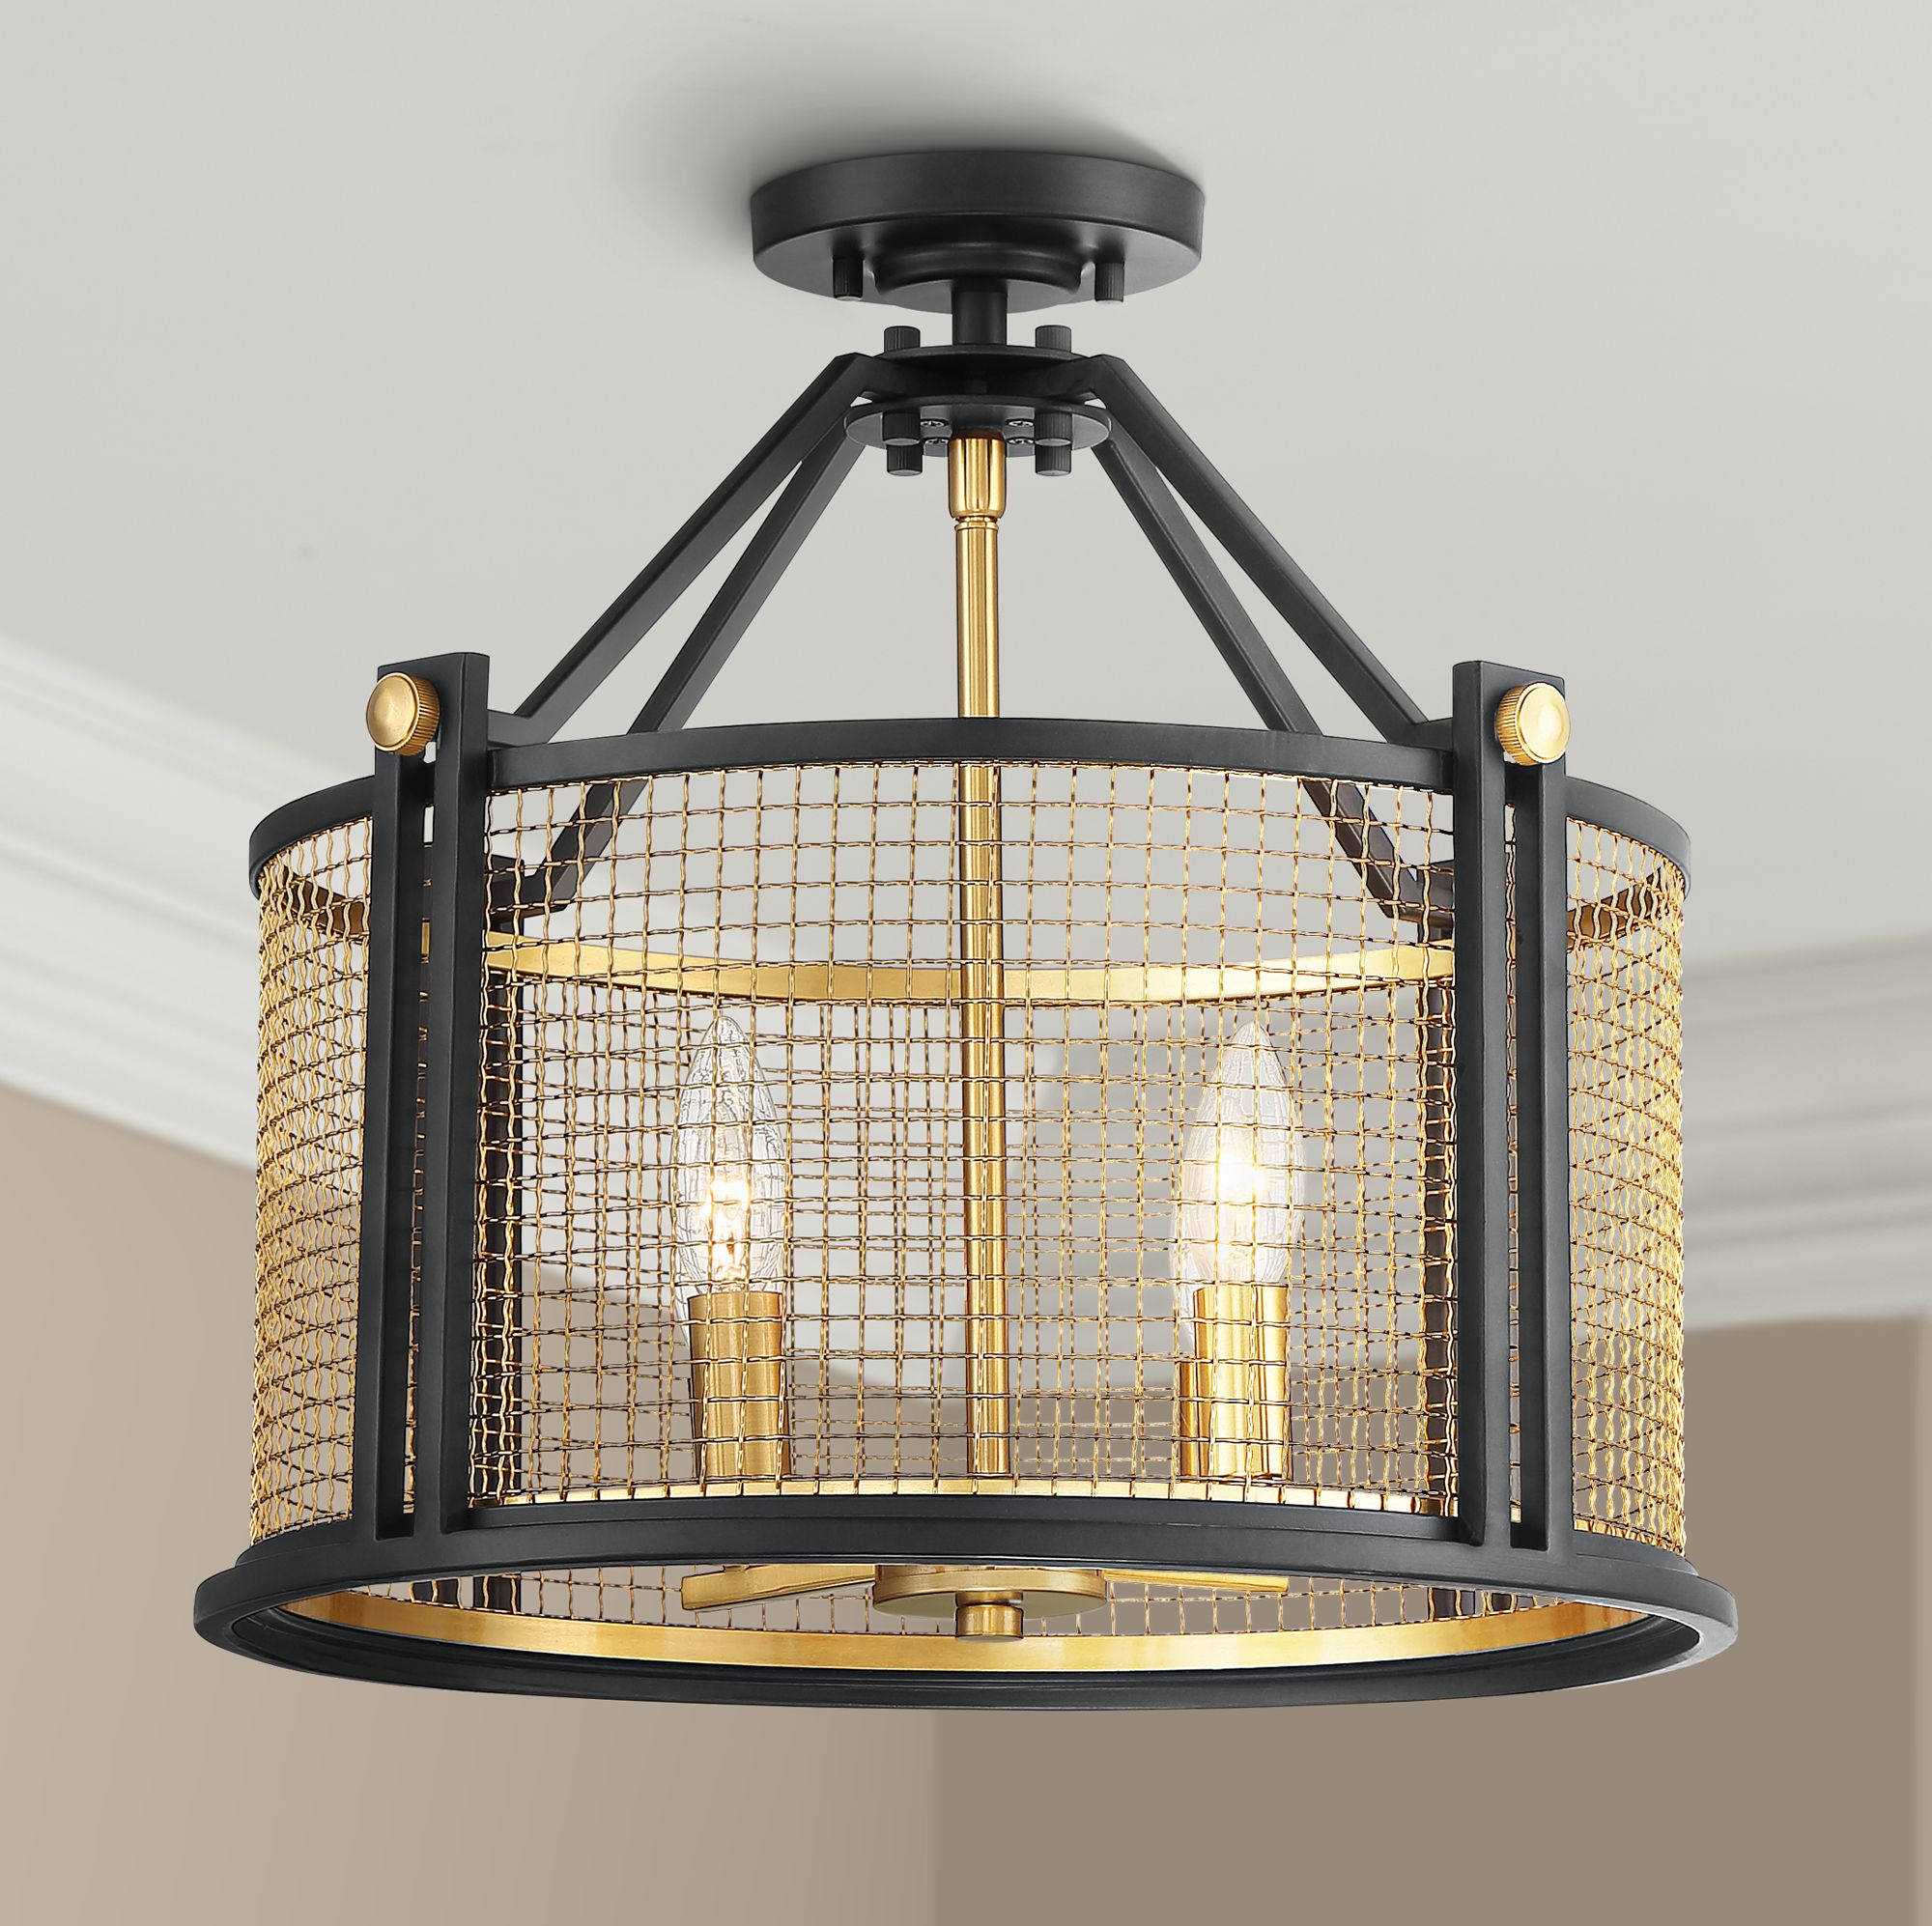 Possini Euro Design Modern Ceiling Light Semi Flush Mount Fixture Black Gold 16 1 2 Wide 4 Light Mesh Drum For Bedroom Kitchen Walmart Com Walmart Com